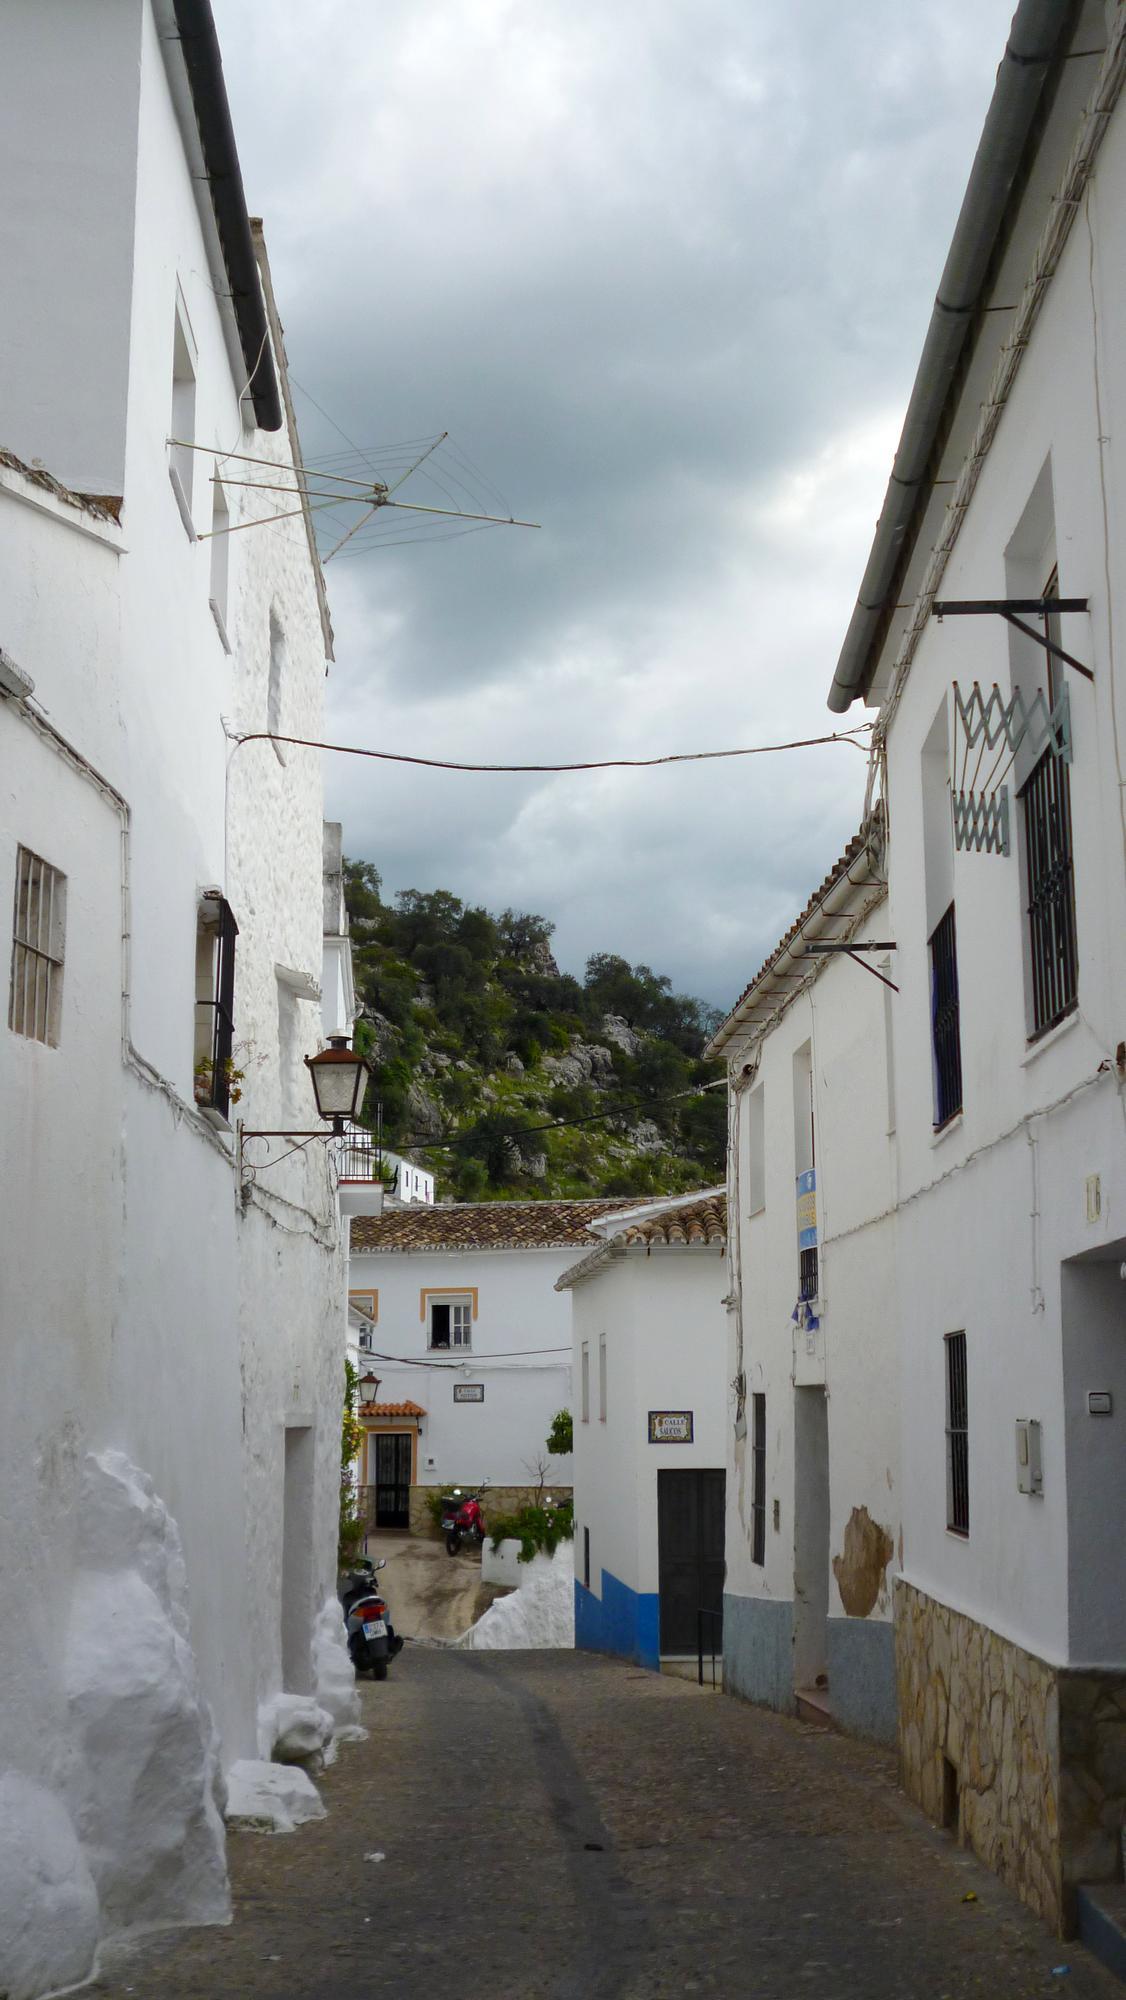 Typická ulička v Ubrique